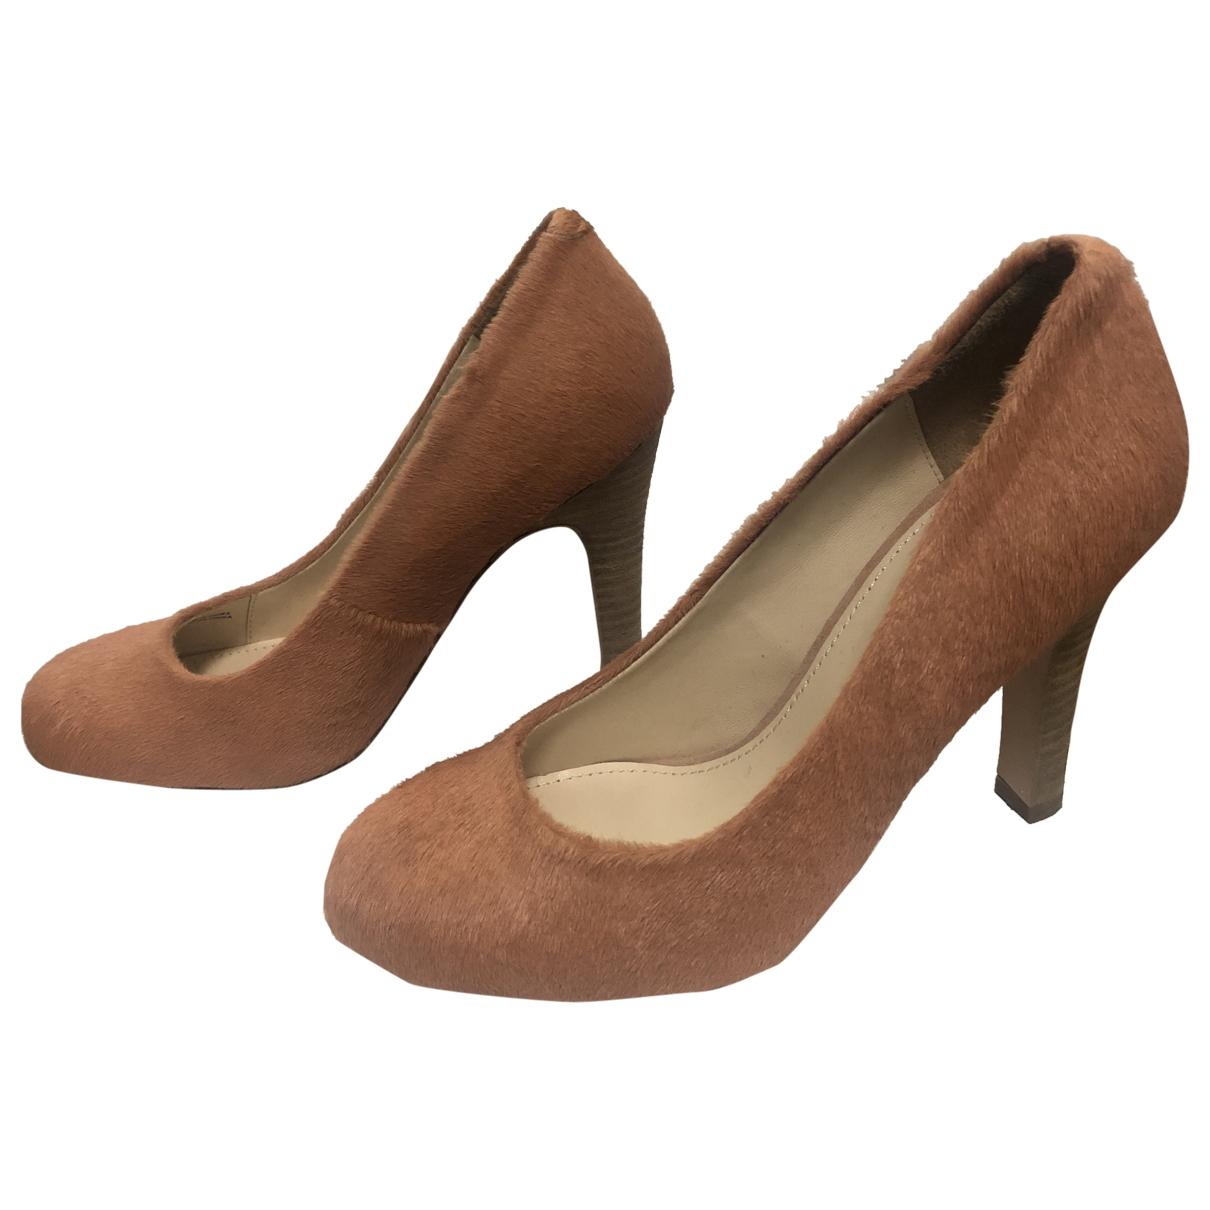 Bimba Y Lola \N Orange Pony-style calfskin Heels for Women 36 EU